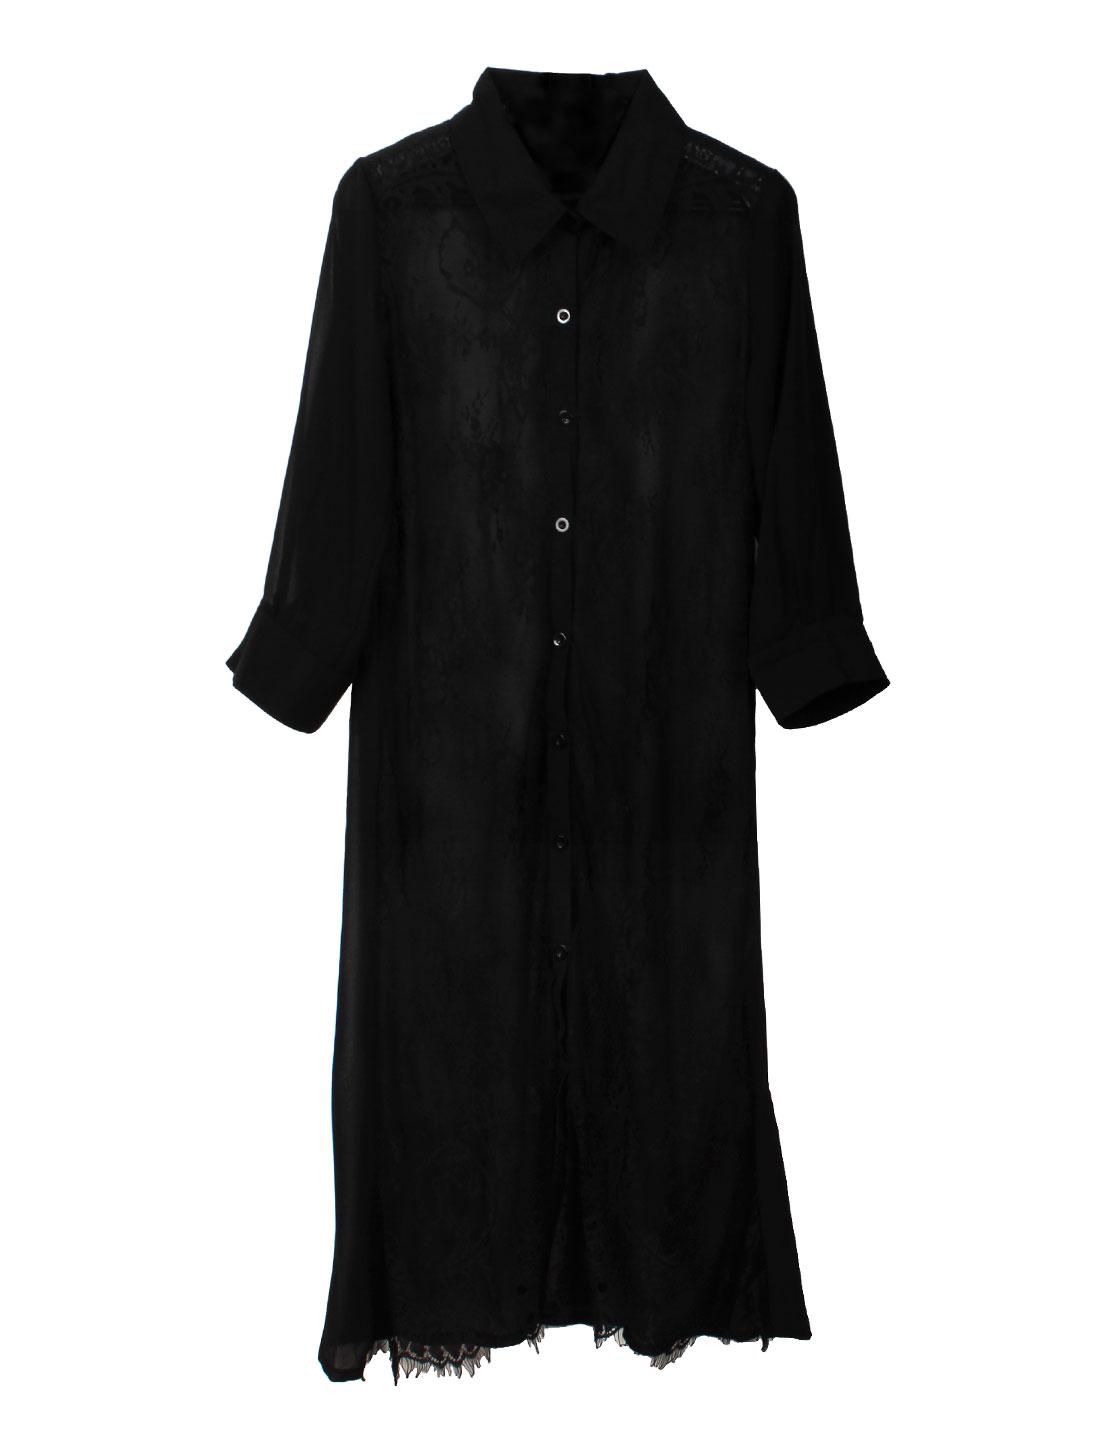 Ladies See Through Lace Eyelash Hem Long Chiffon Shirt Black S